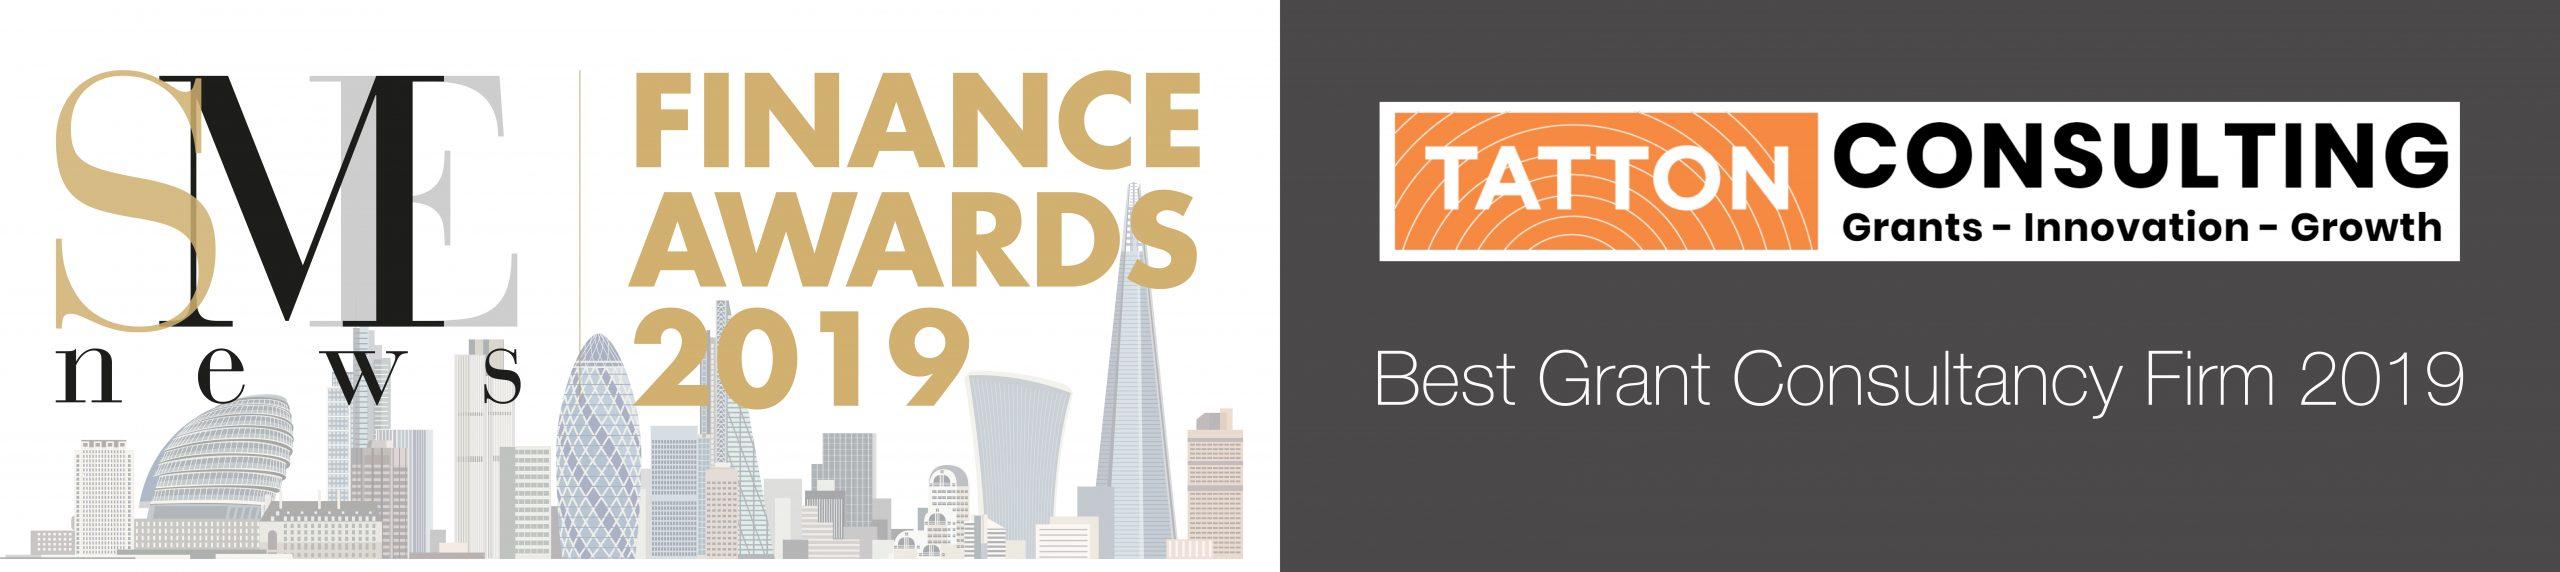 Oct19297-Finance Awards 2019 Banner Winners Logo